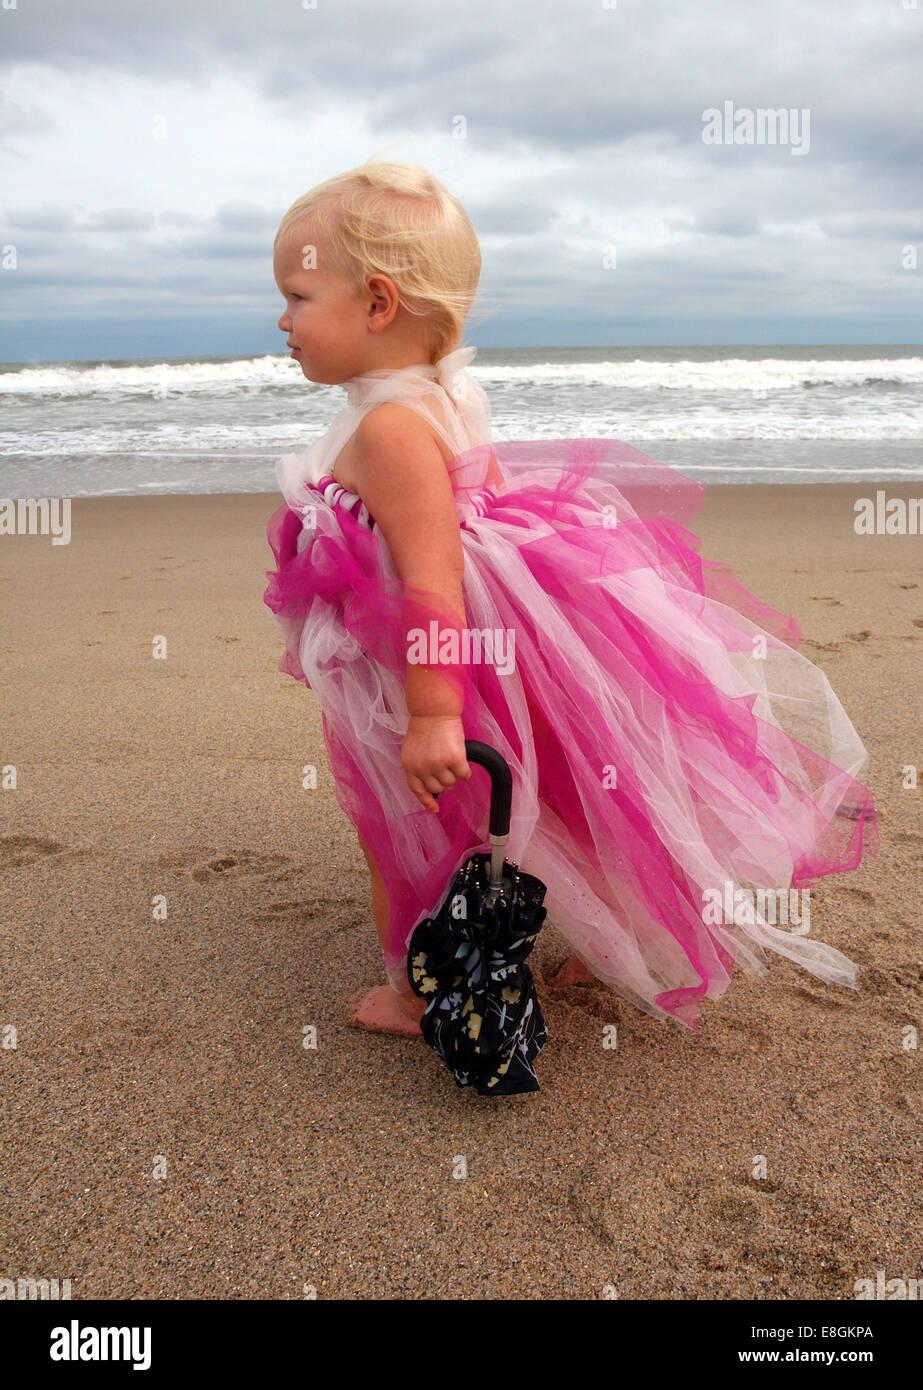 Kure Beach, New Hanover County, North Carolina, United States of America prêt pour la tempête Photo Stock